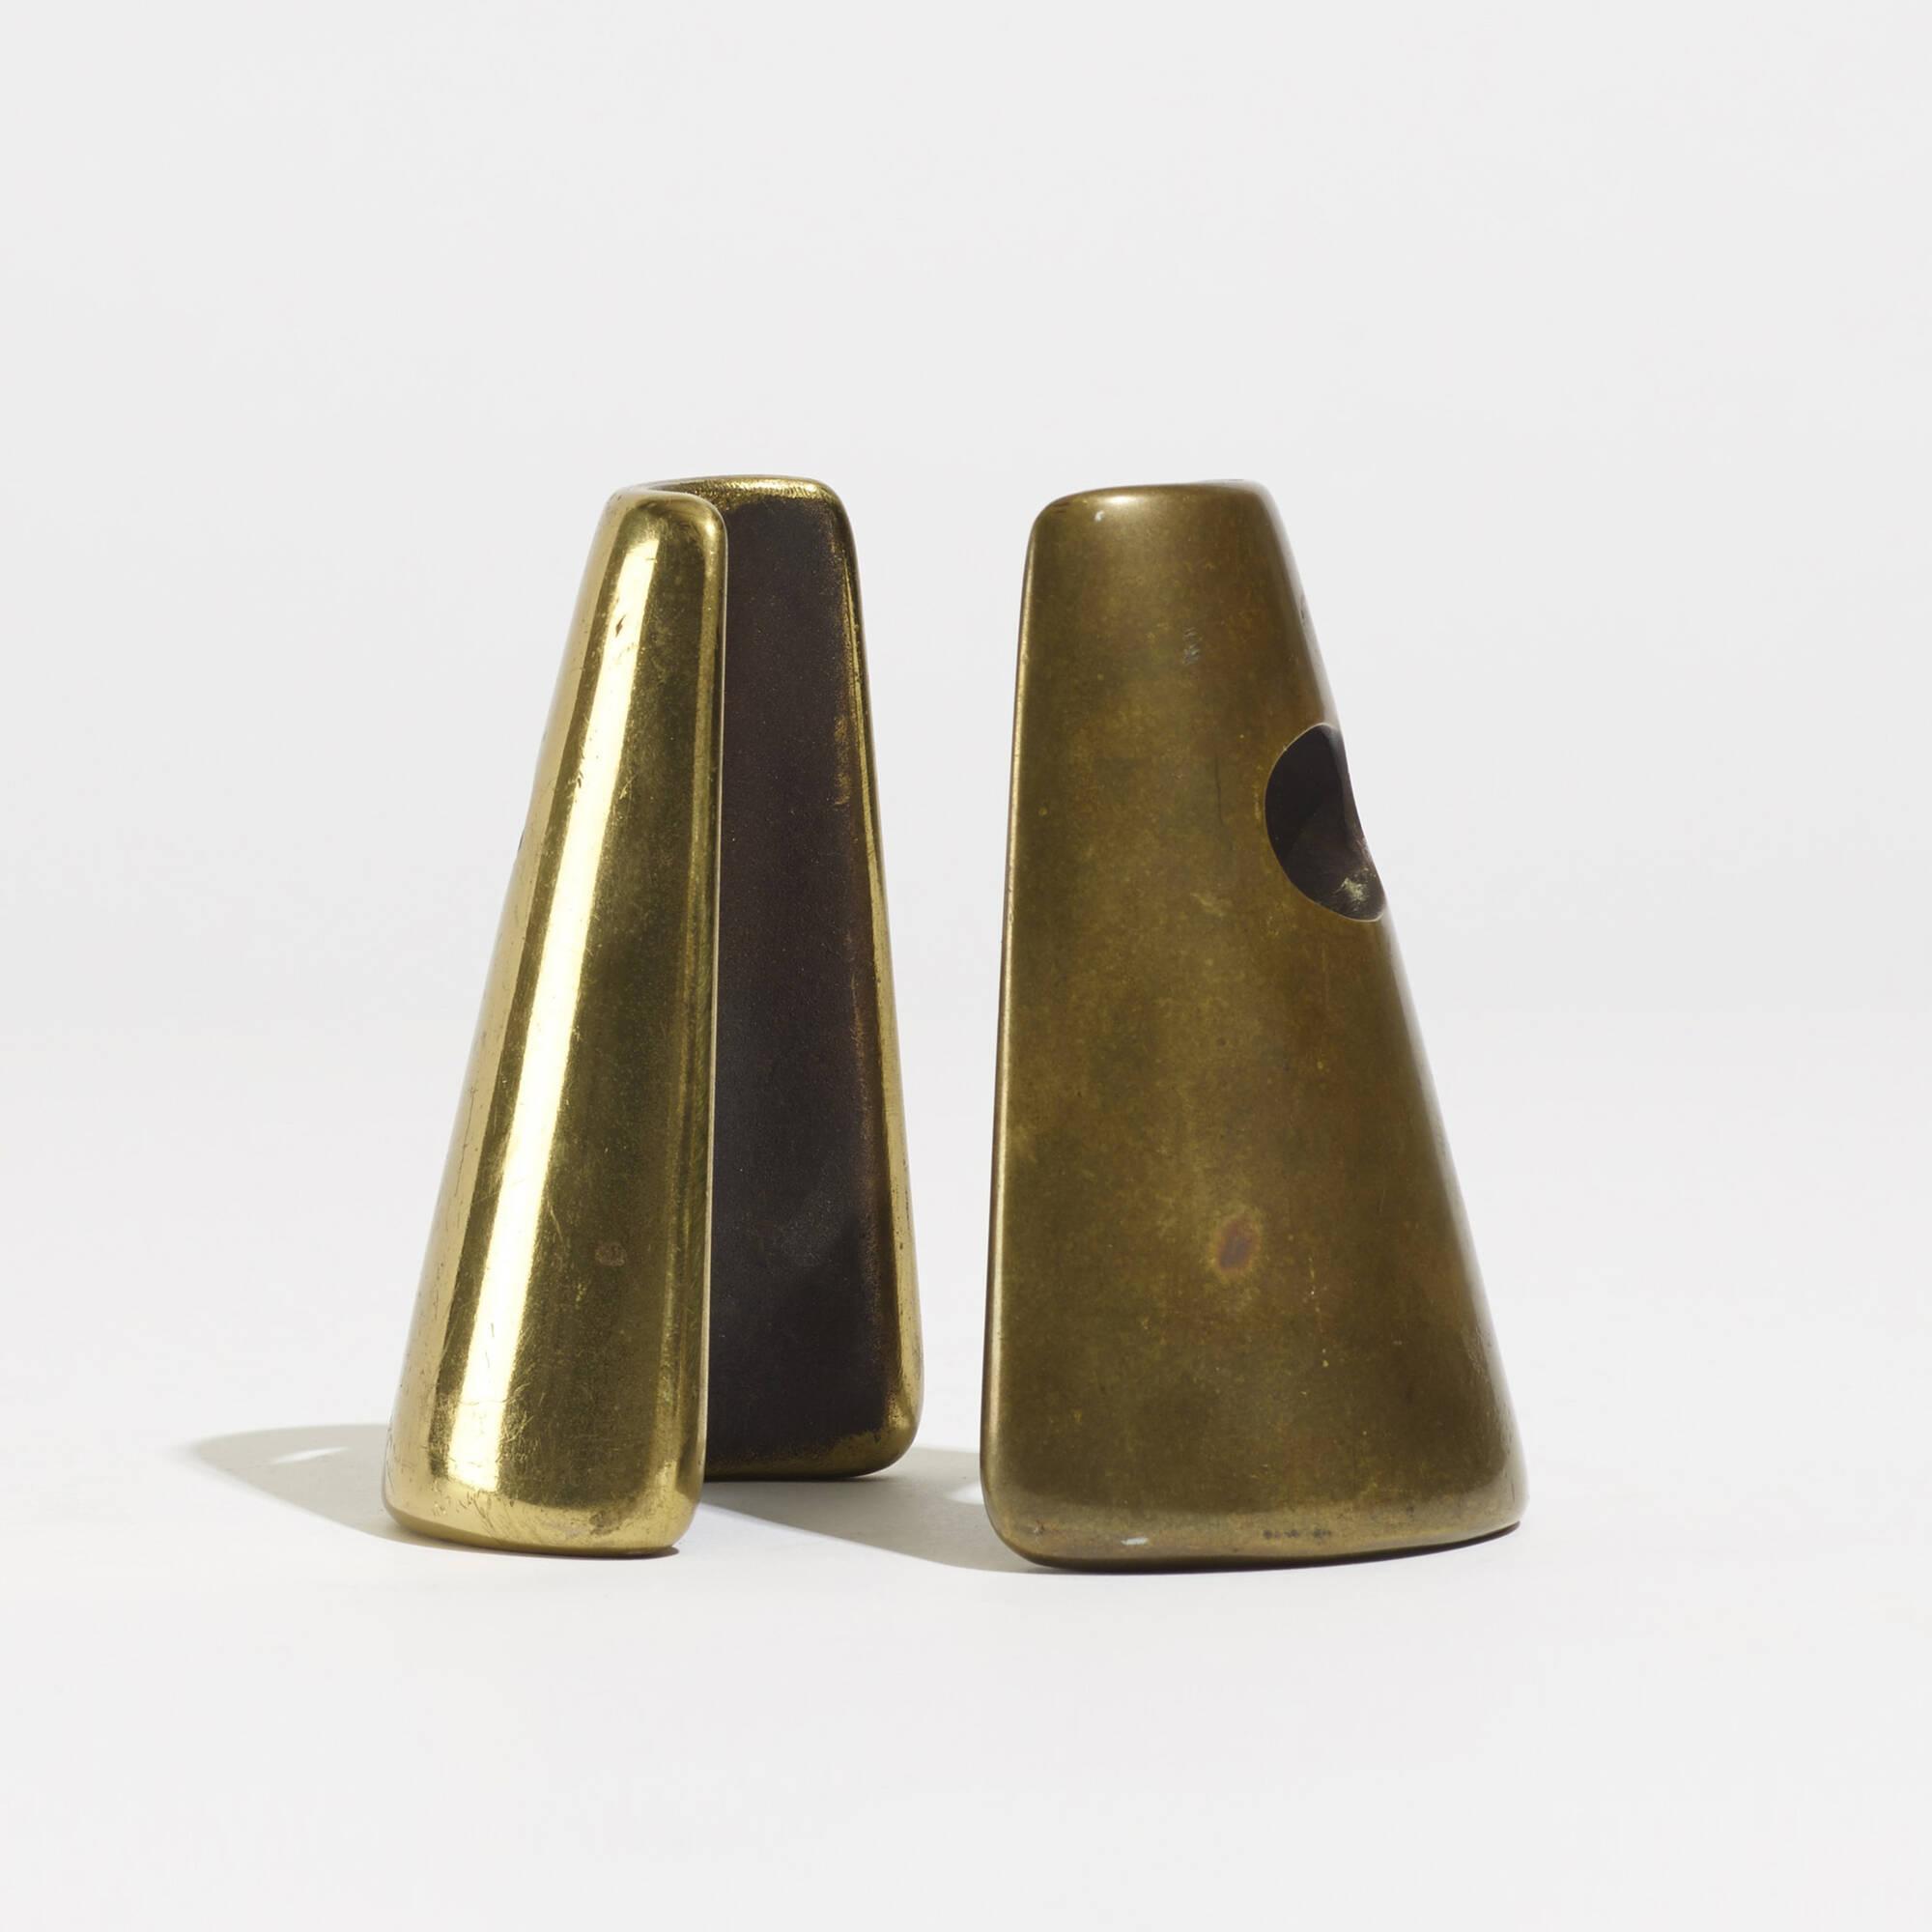 143: Carl Auböck II / bookends, pair (3 of 4)